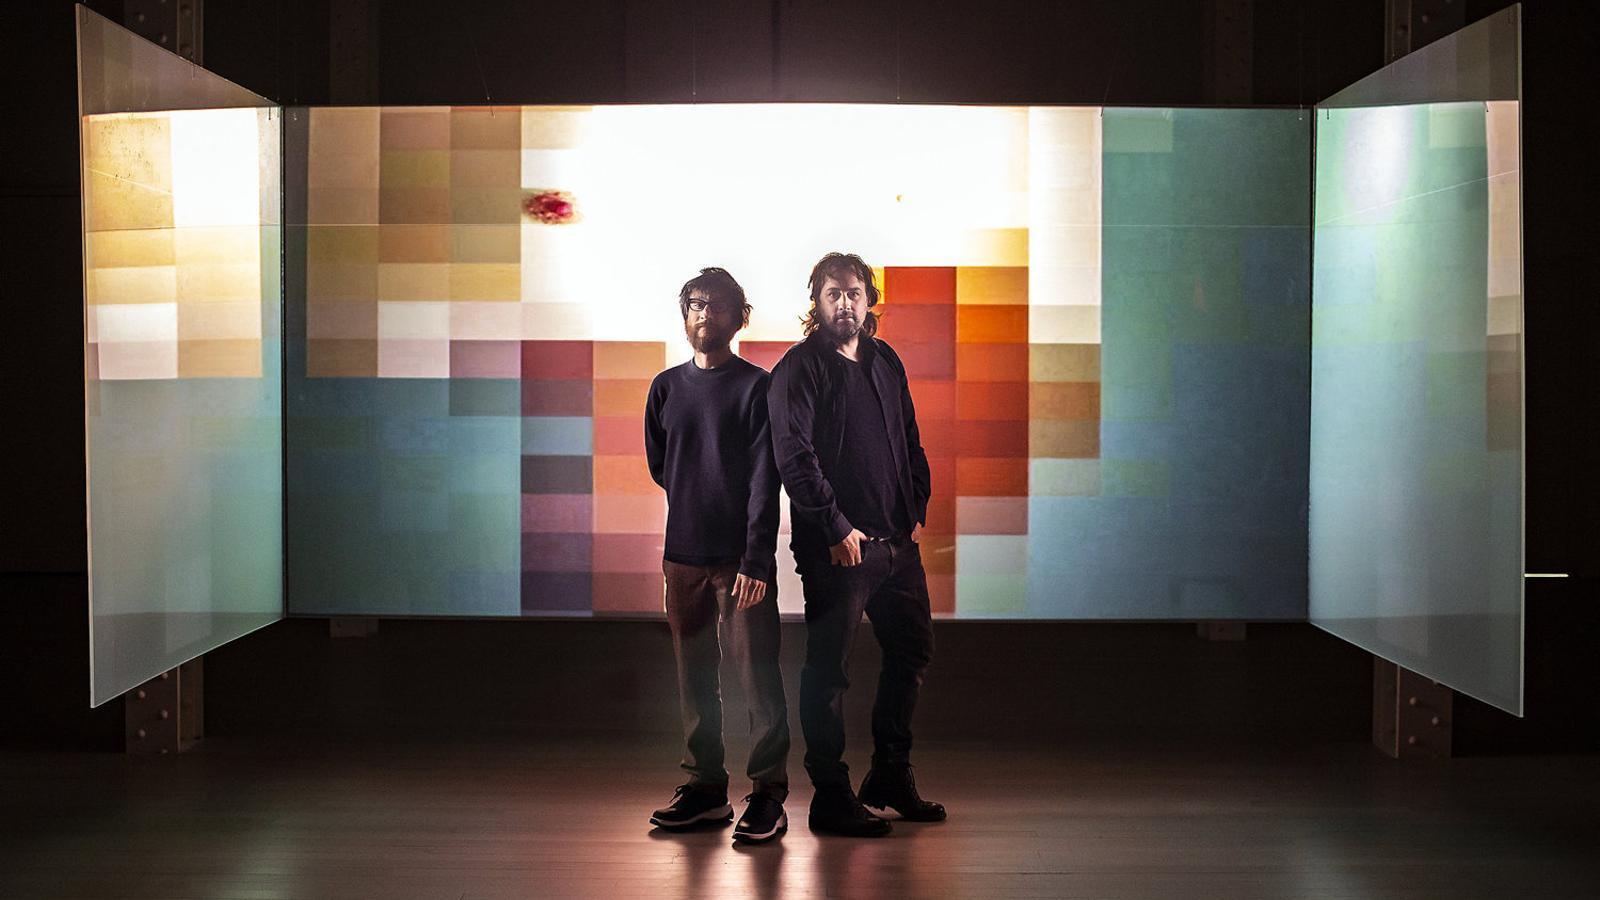 Refree i Isaki Lacuesta conviden el públic a fer de videojòquei